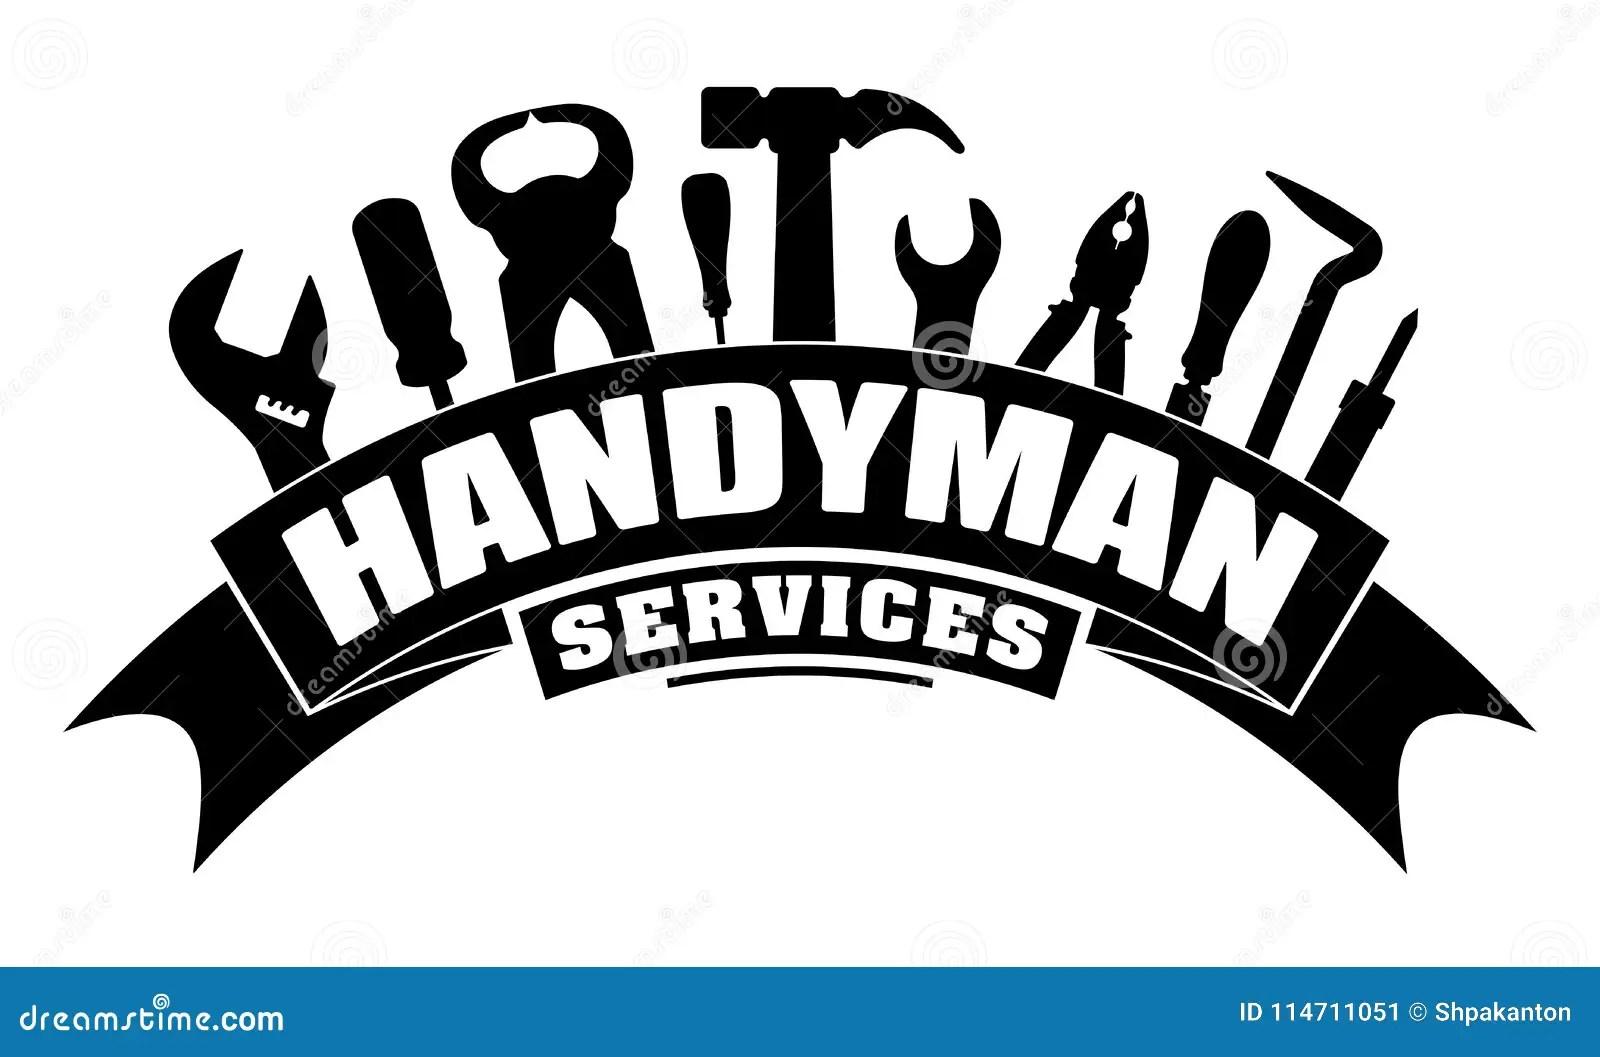 Handyman Services Vector Design For Your Logo Or Emblem